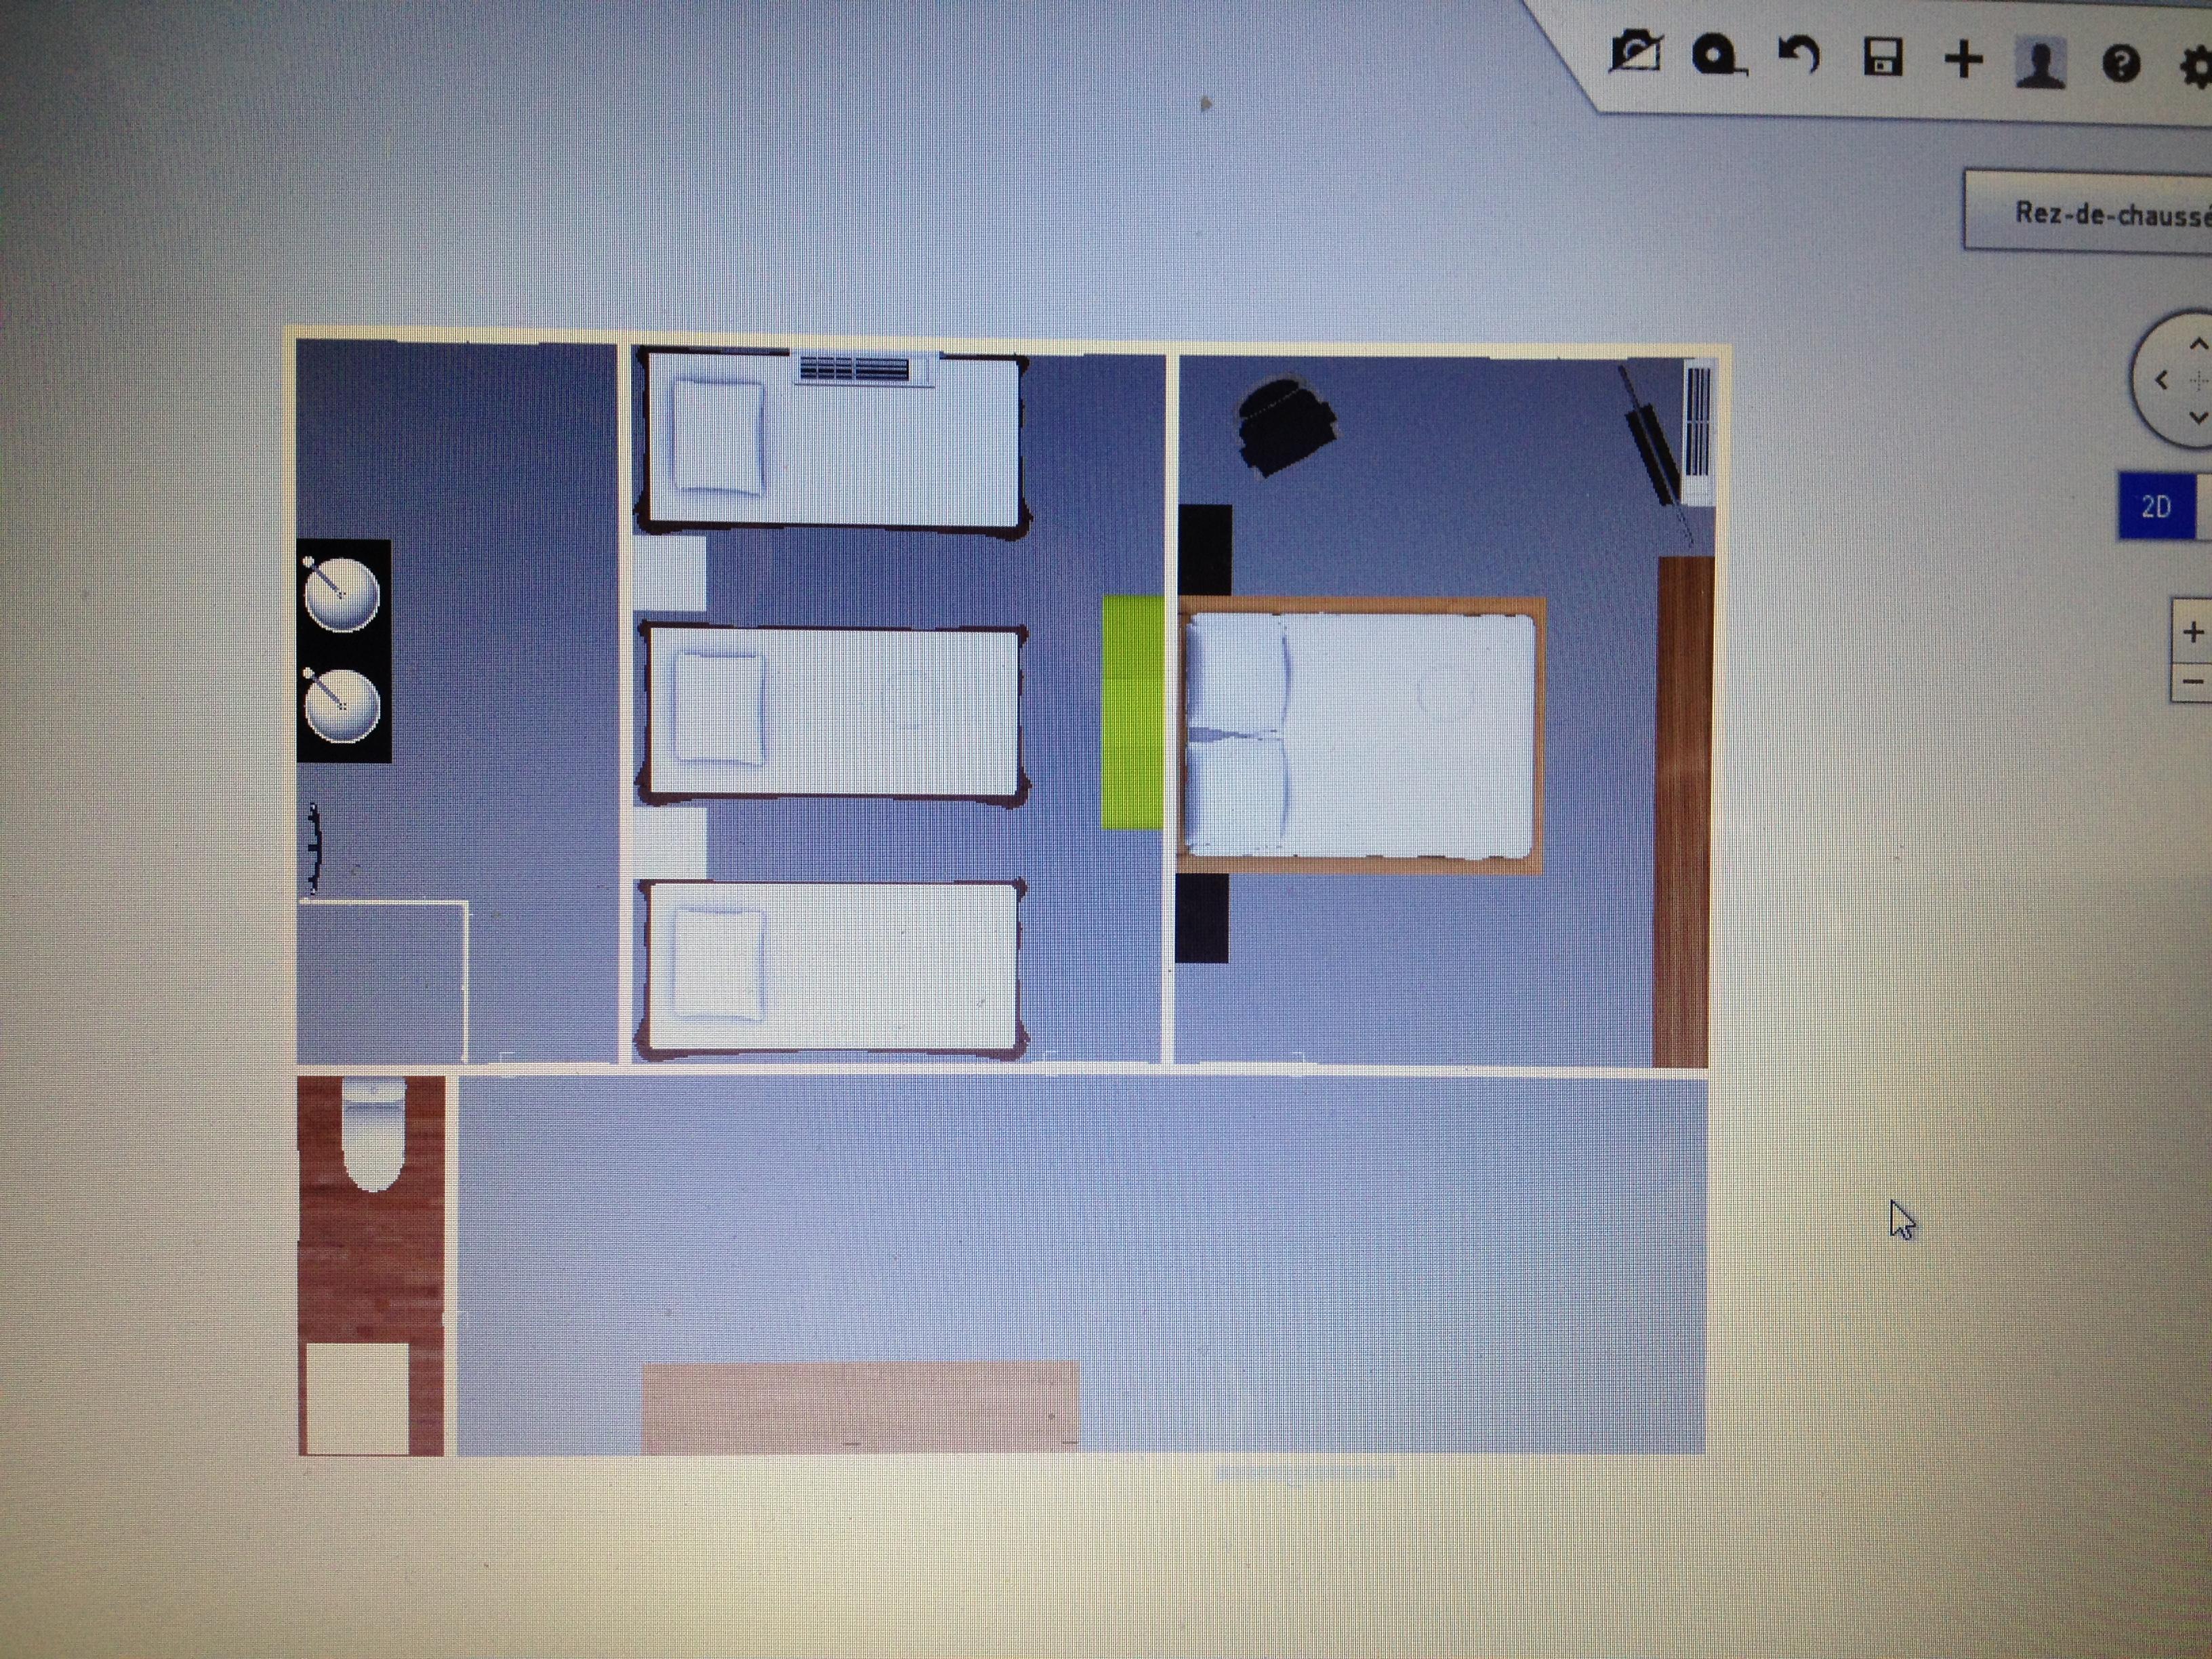 r novation et lectricit par o passer communaut. Black Bedroom Furniture Sets. Home Design Ideas